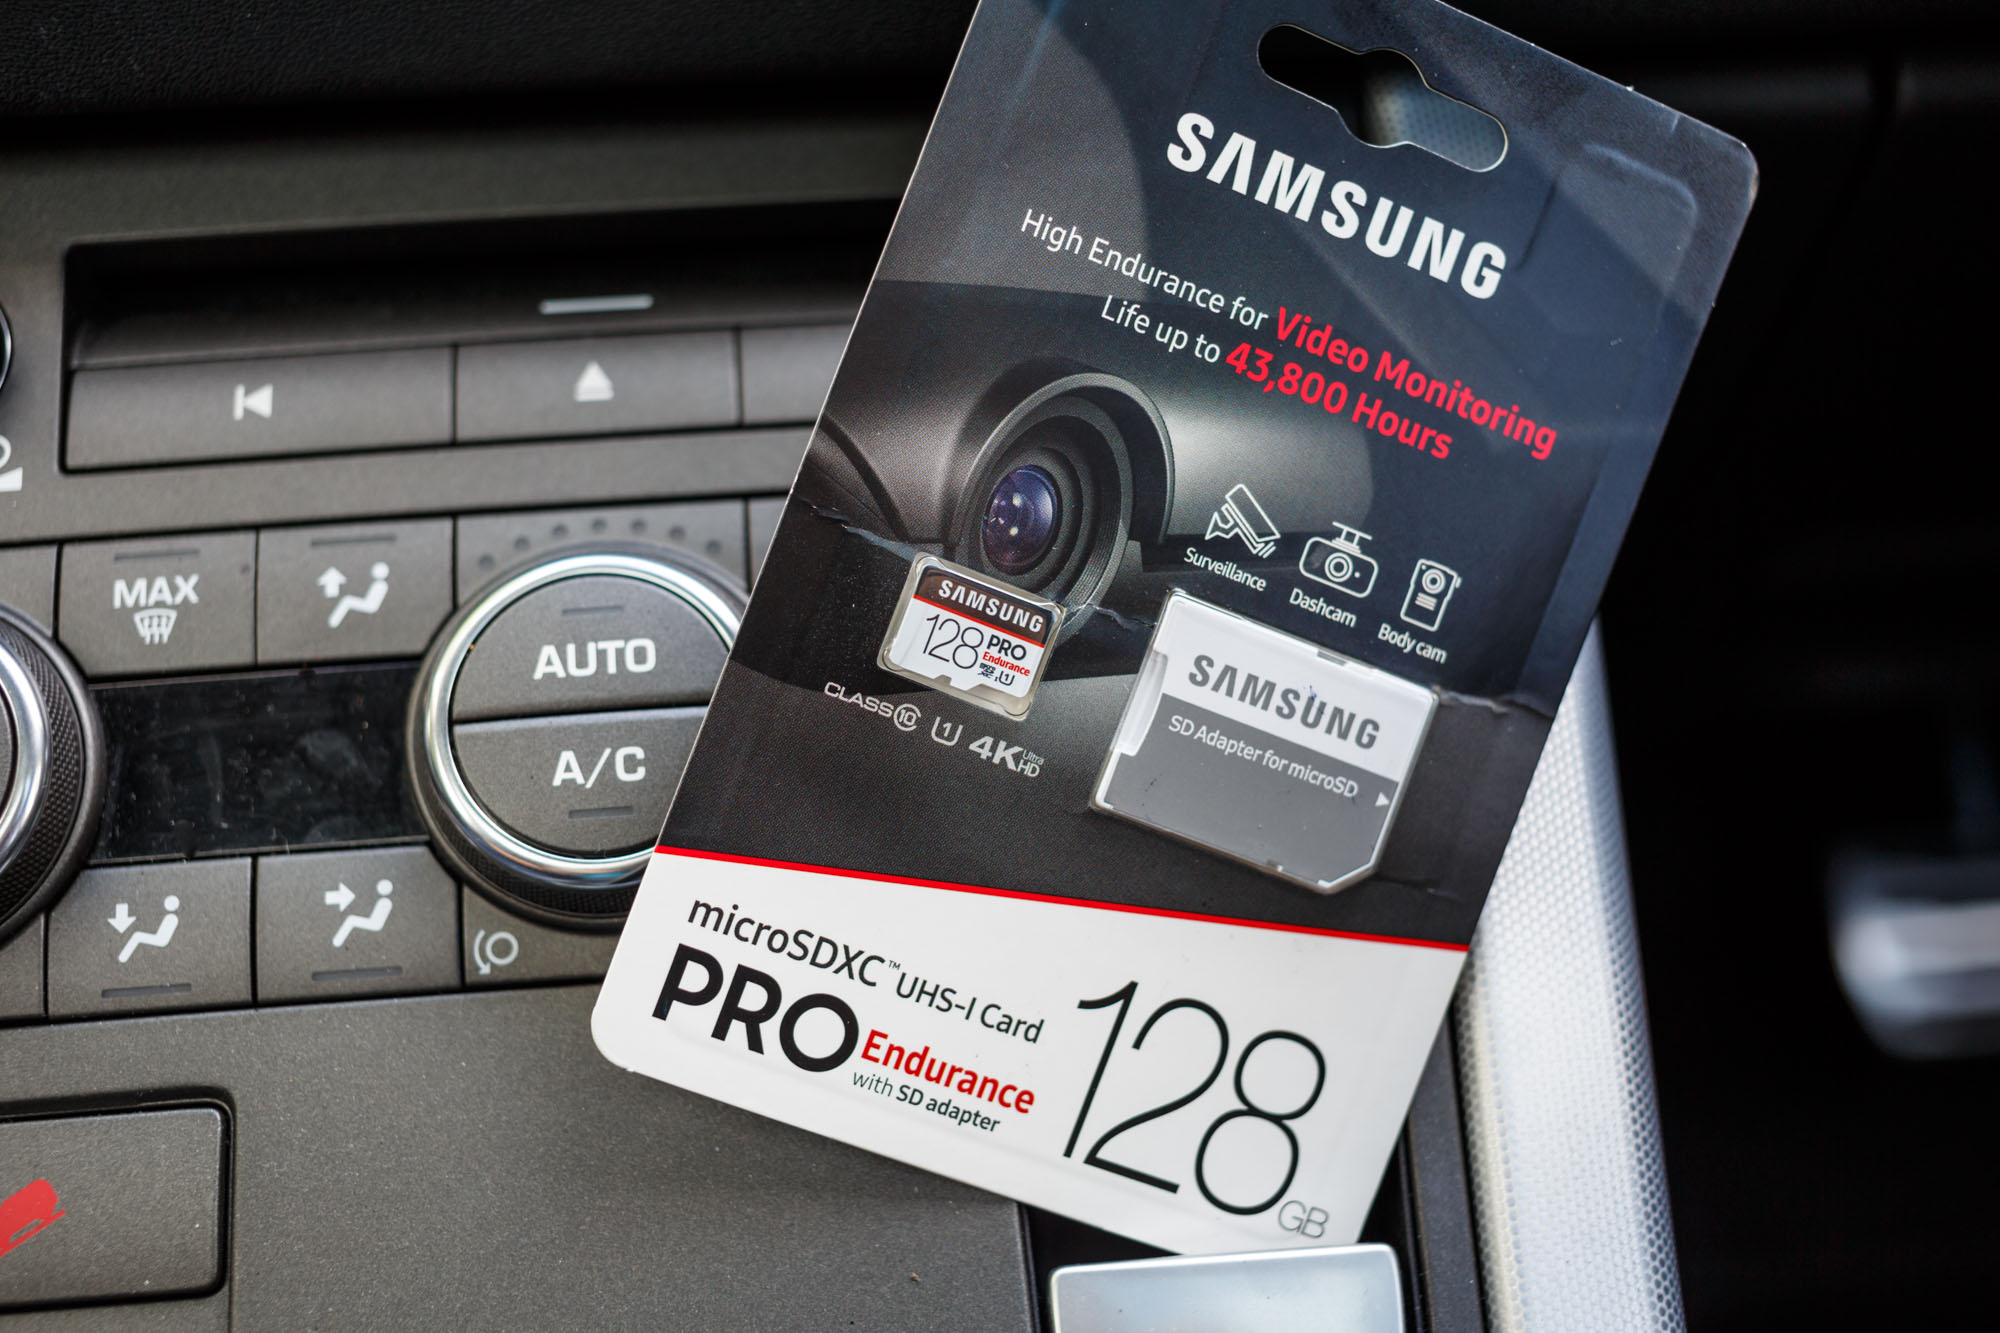 Samsung Micro SD 0003.jpg